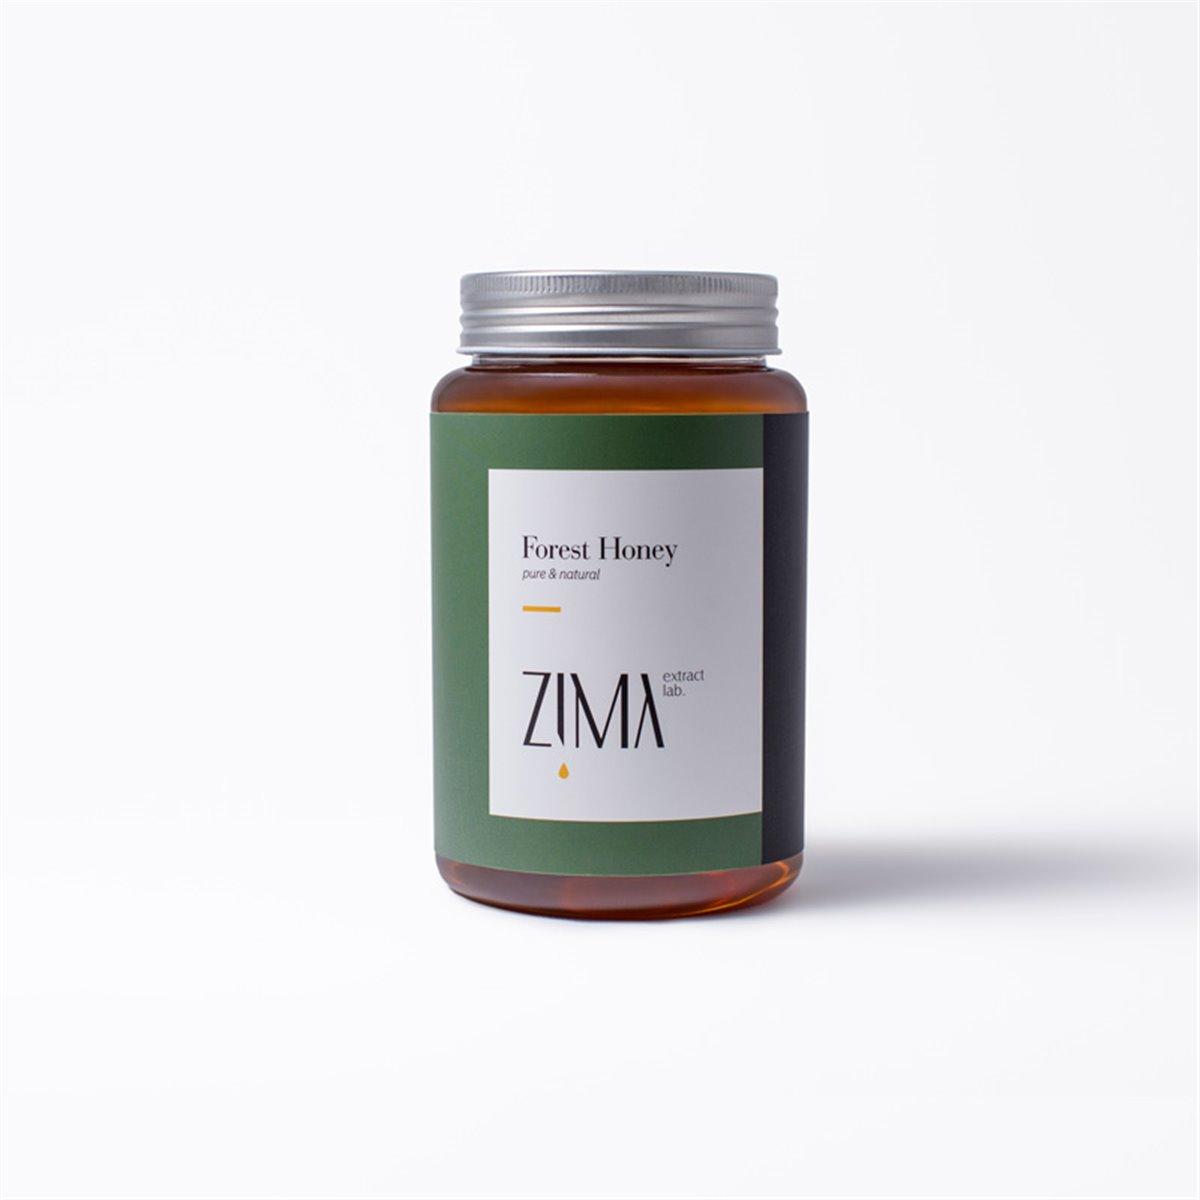 کاهش گلودرد و سرفه با عسل جنگلی خالص زیمالب